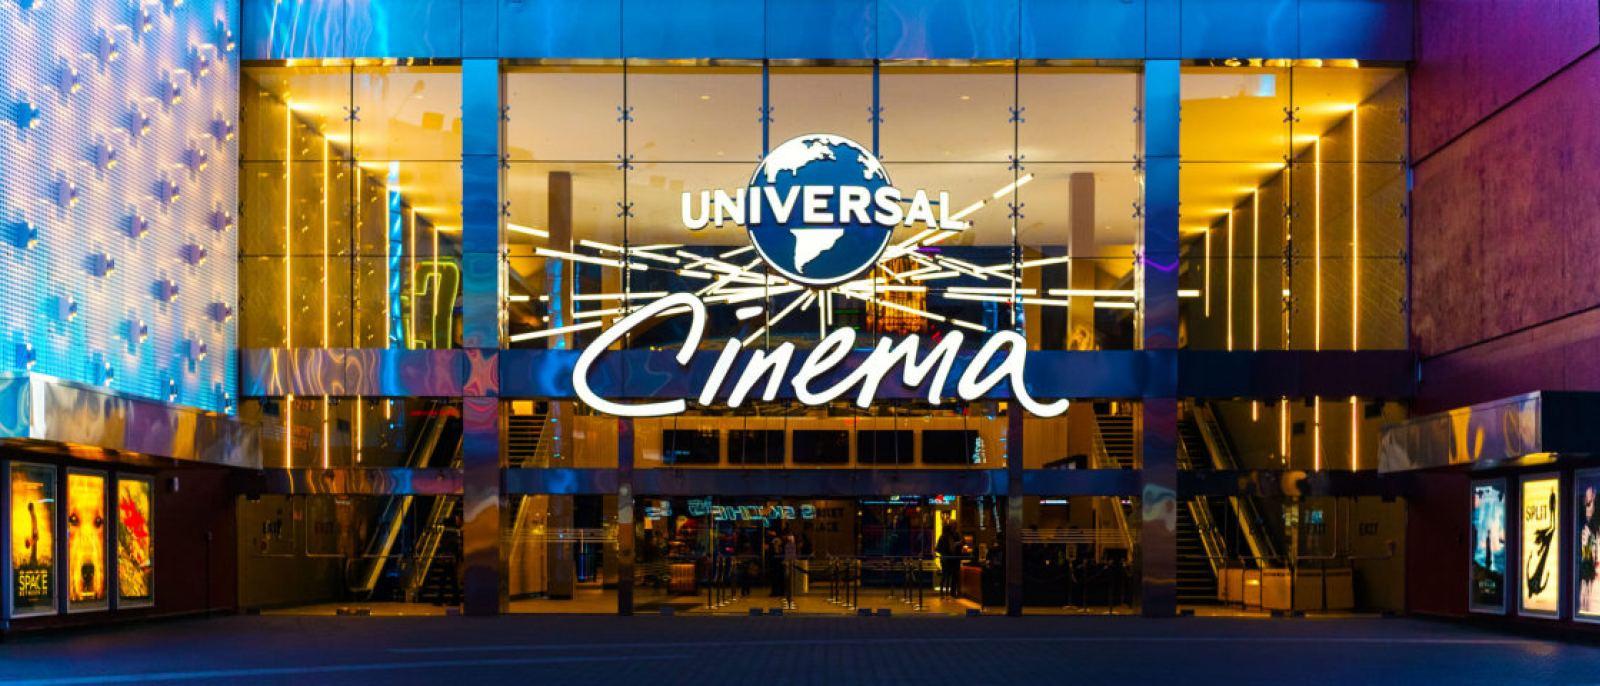 Universal Cinema at CityWalk Hollywood | Photo: Universal Studios Hollywood